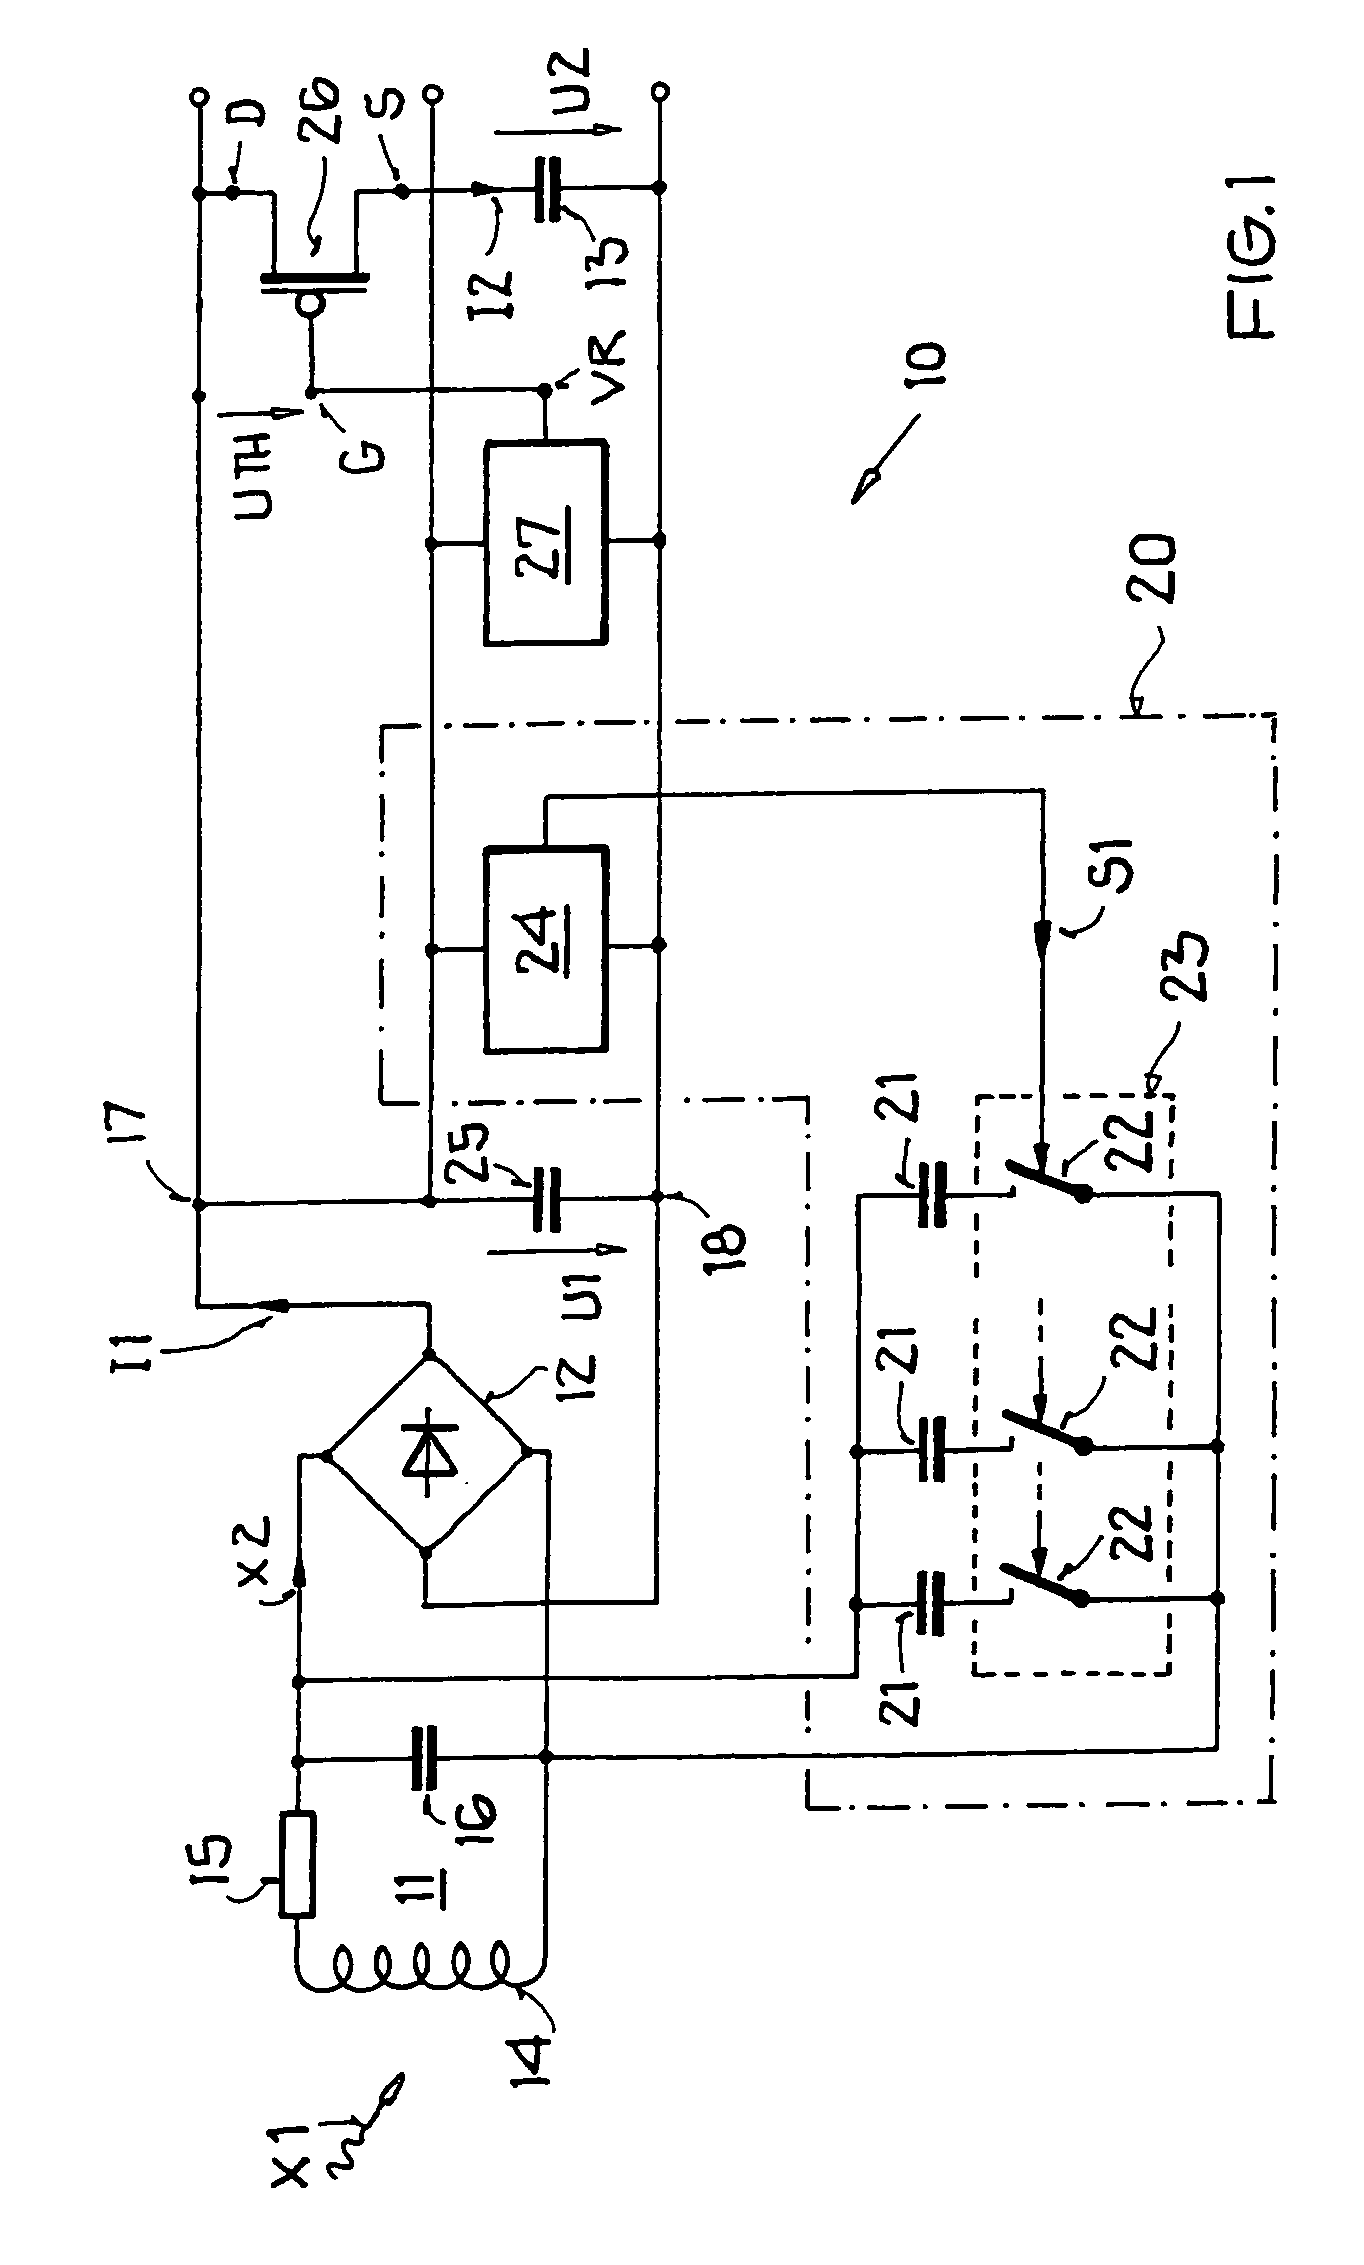 Transponder Key Schematic